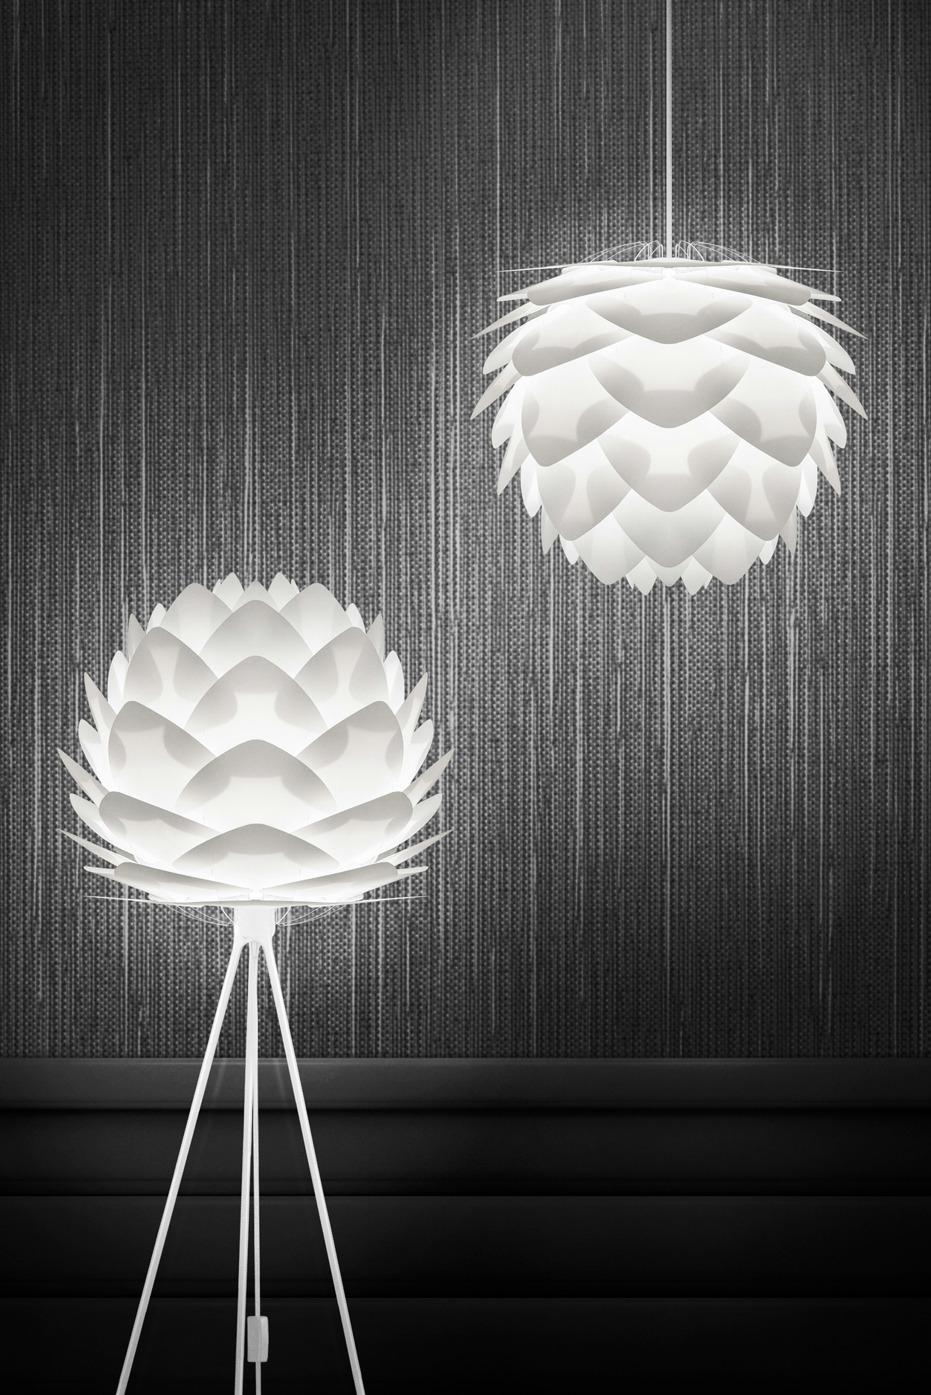 vita-silvia-lampa-bordslampa-taklampa-belysning-brunnsboden-lampskarm